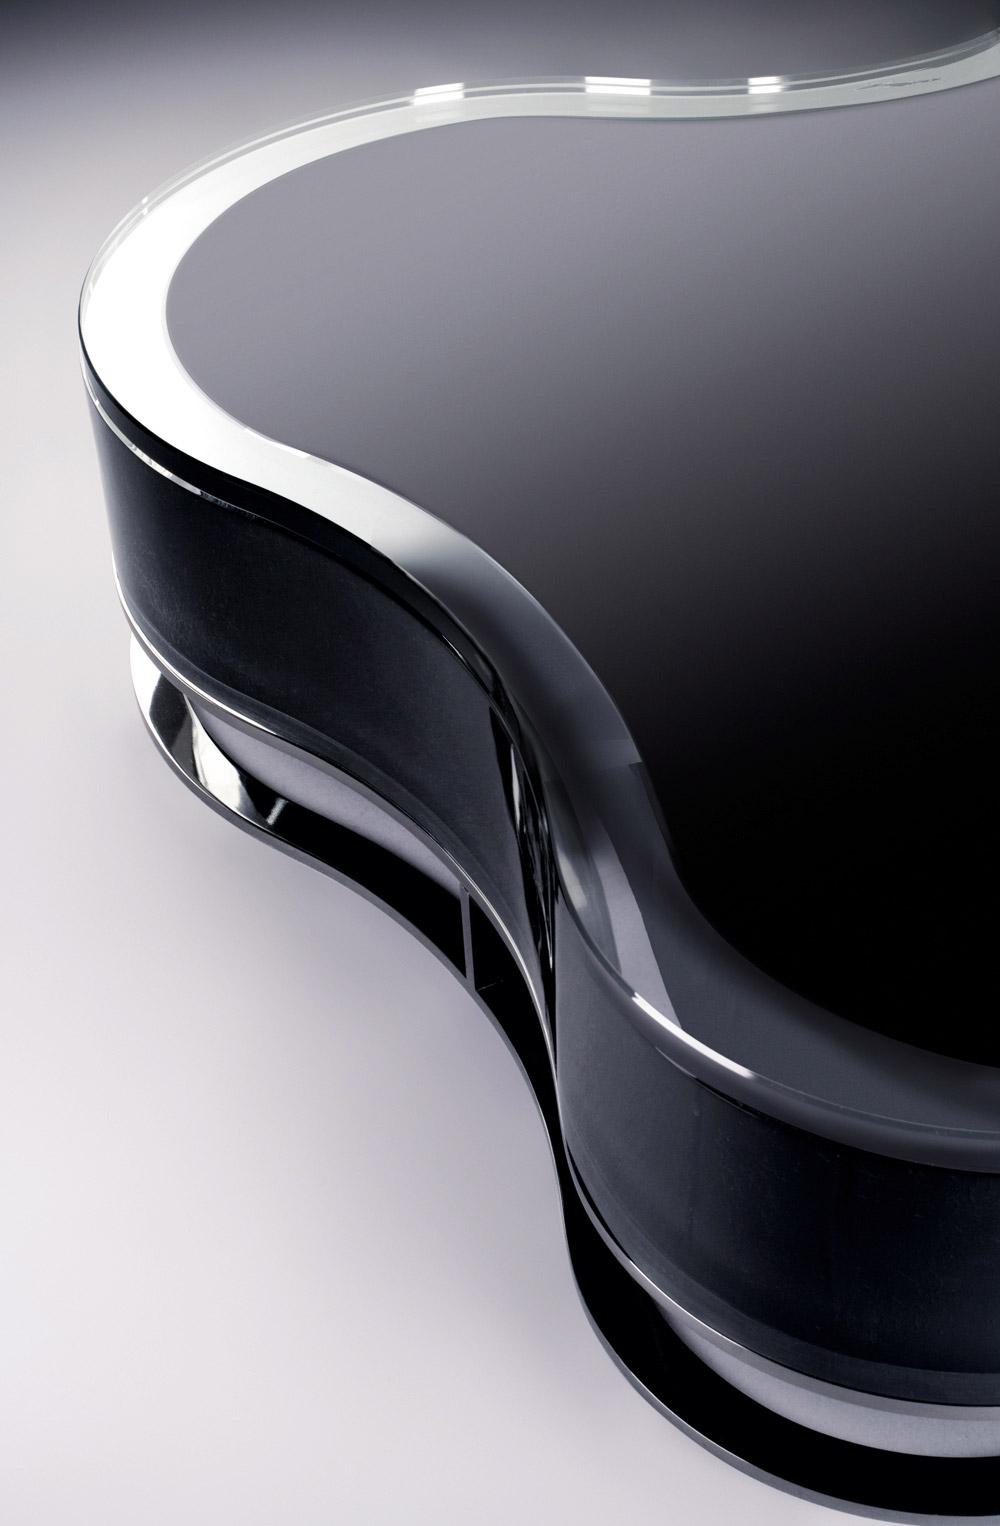 Custom furniture design black glass table close-up